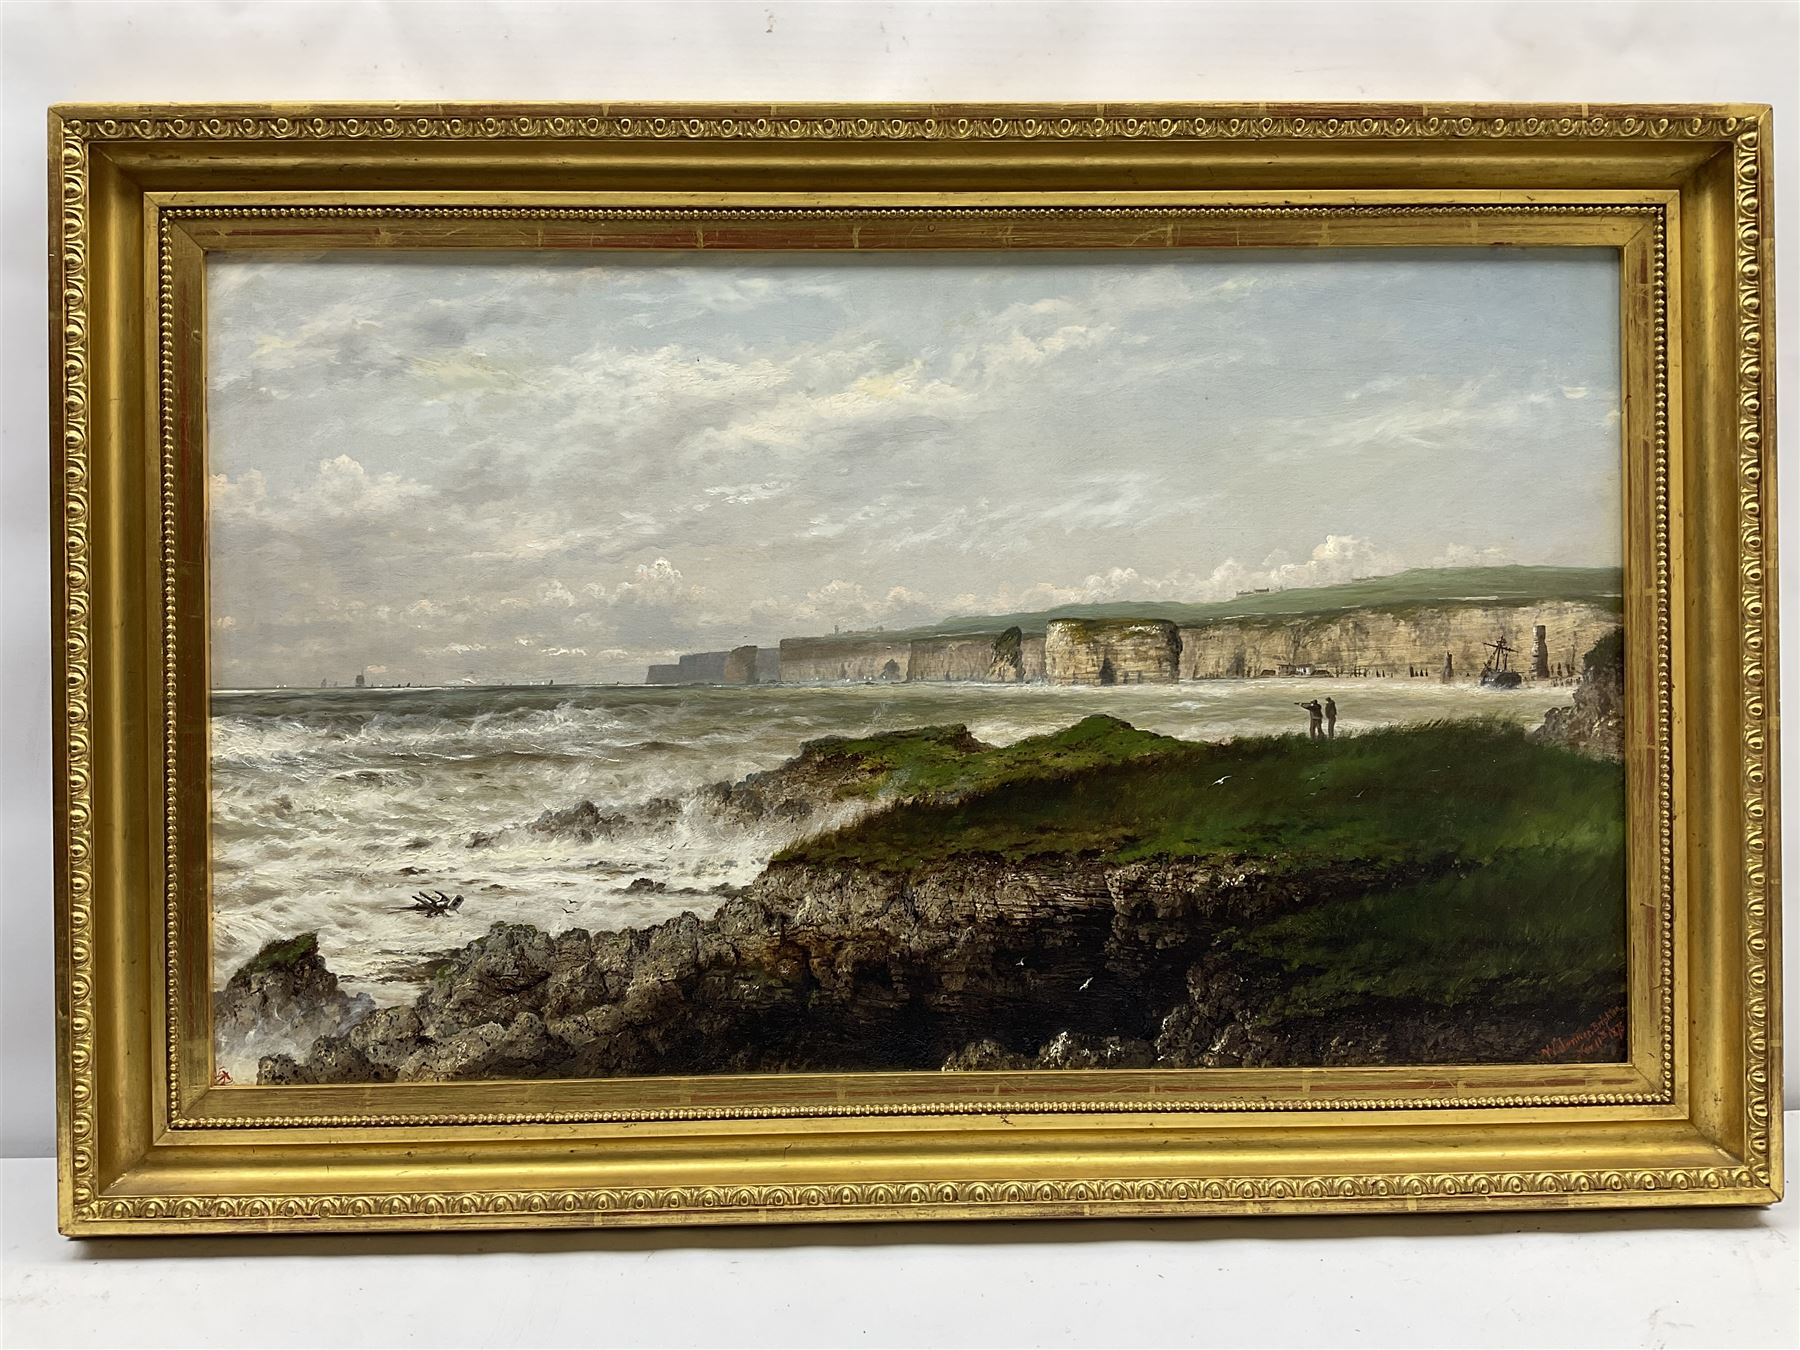 Isaac Walter Jenner (British 1836-1902): Bempton Cliffs and Flamborough Head - Image 2 of 4